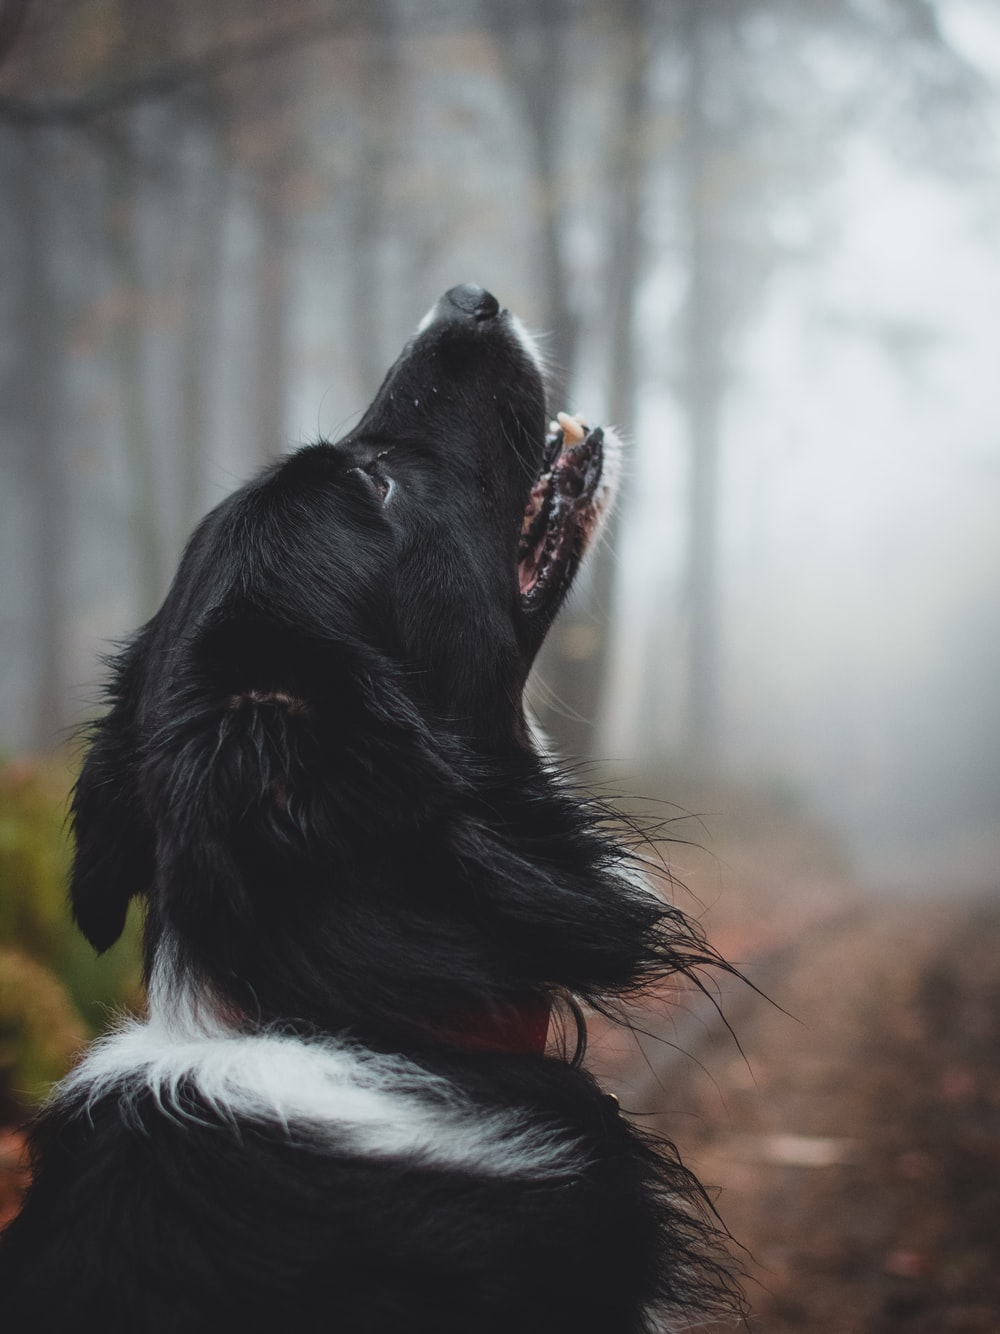 howling short-coat black and white dog under shade of trees